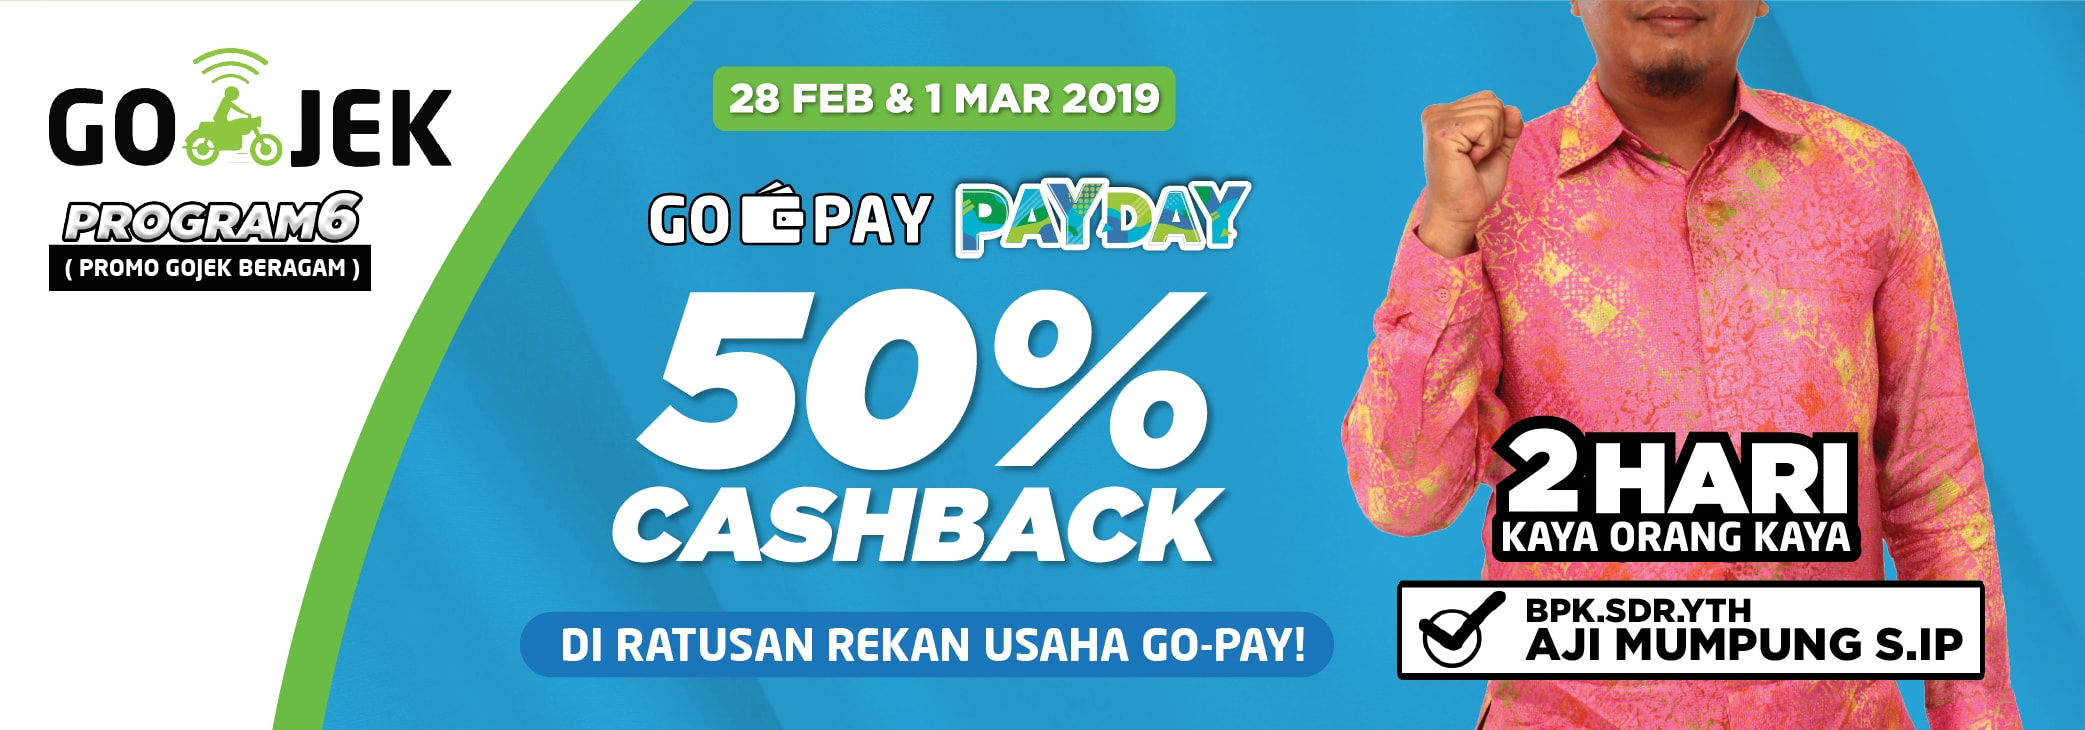 Promo GO-PAY PAY DAY Februari 2019: Cashback 50% di Mana-mana